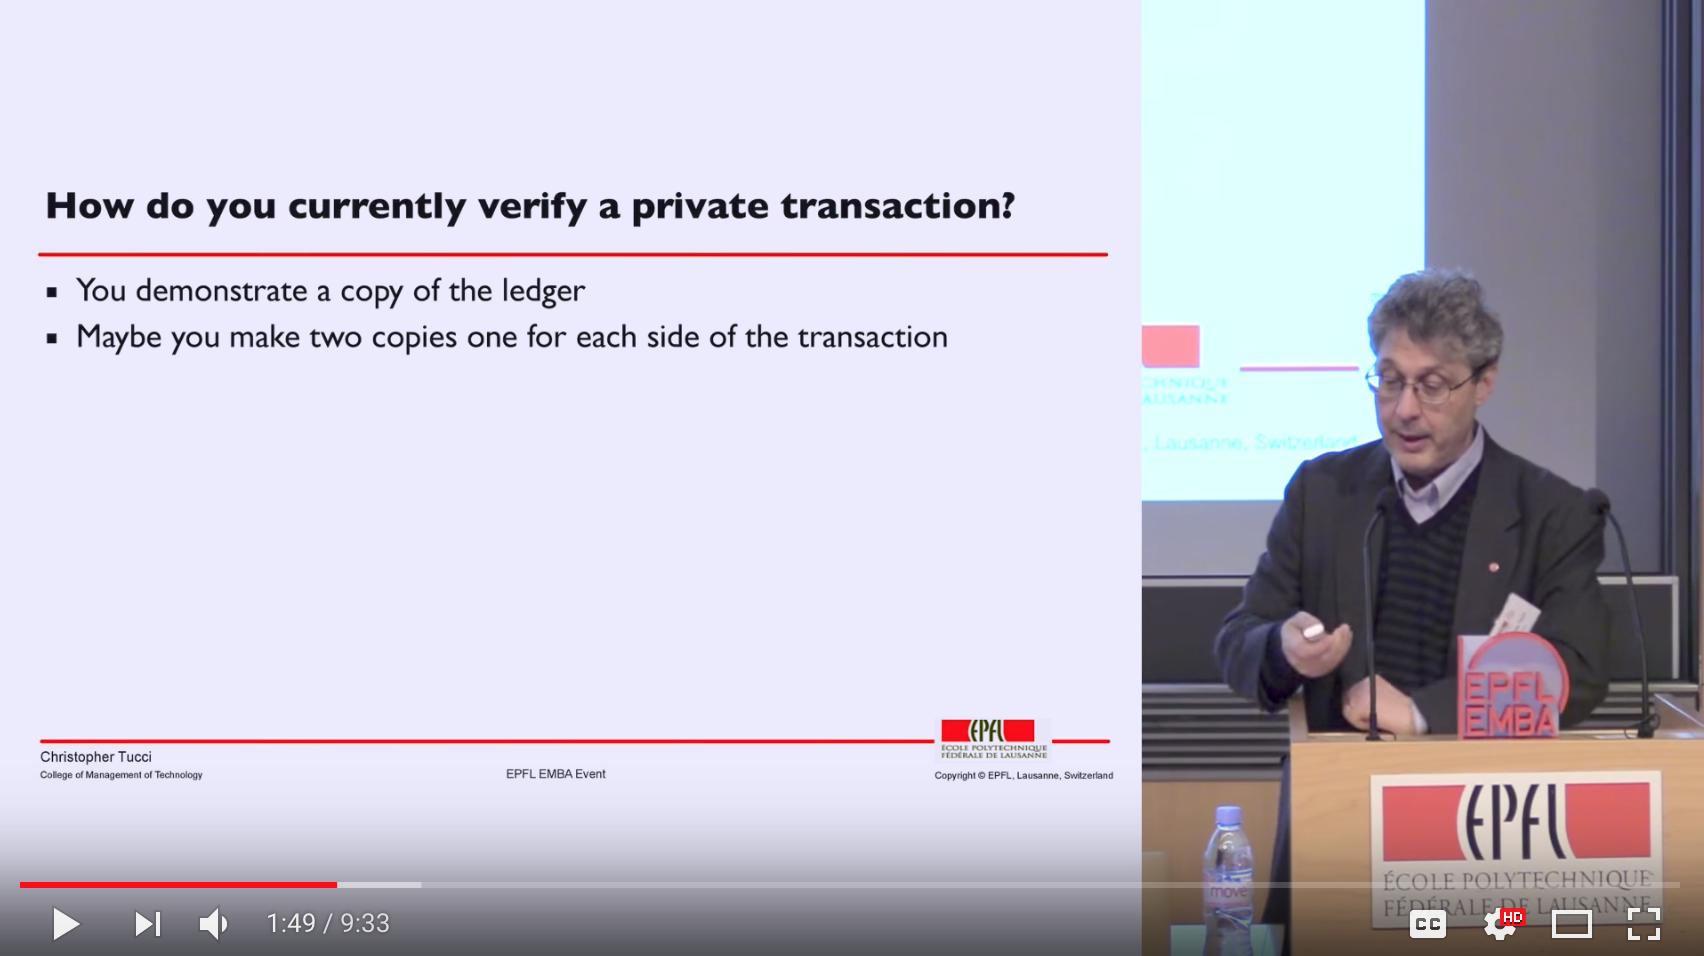 Blockchain 101 - Episode 1 - Introduction - Blog - The Computer Firm - Raphael Sculati